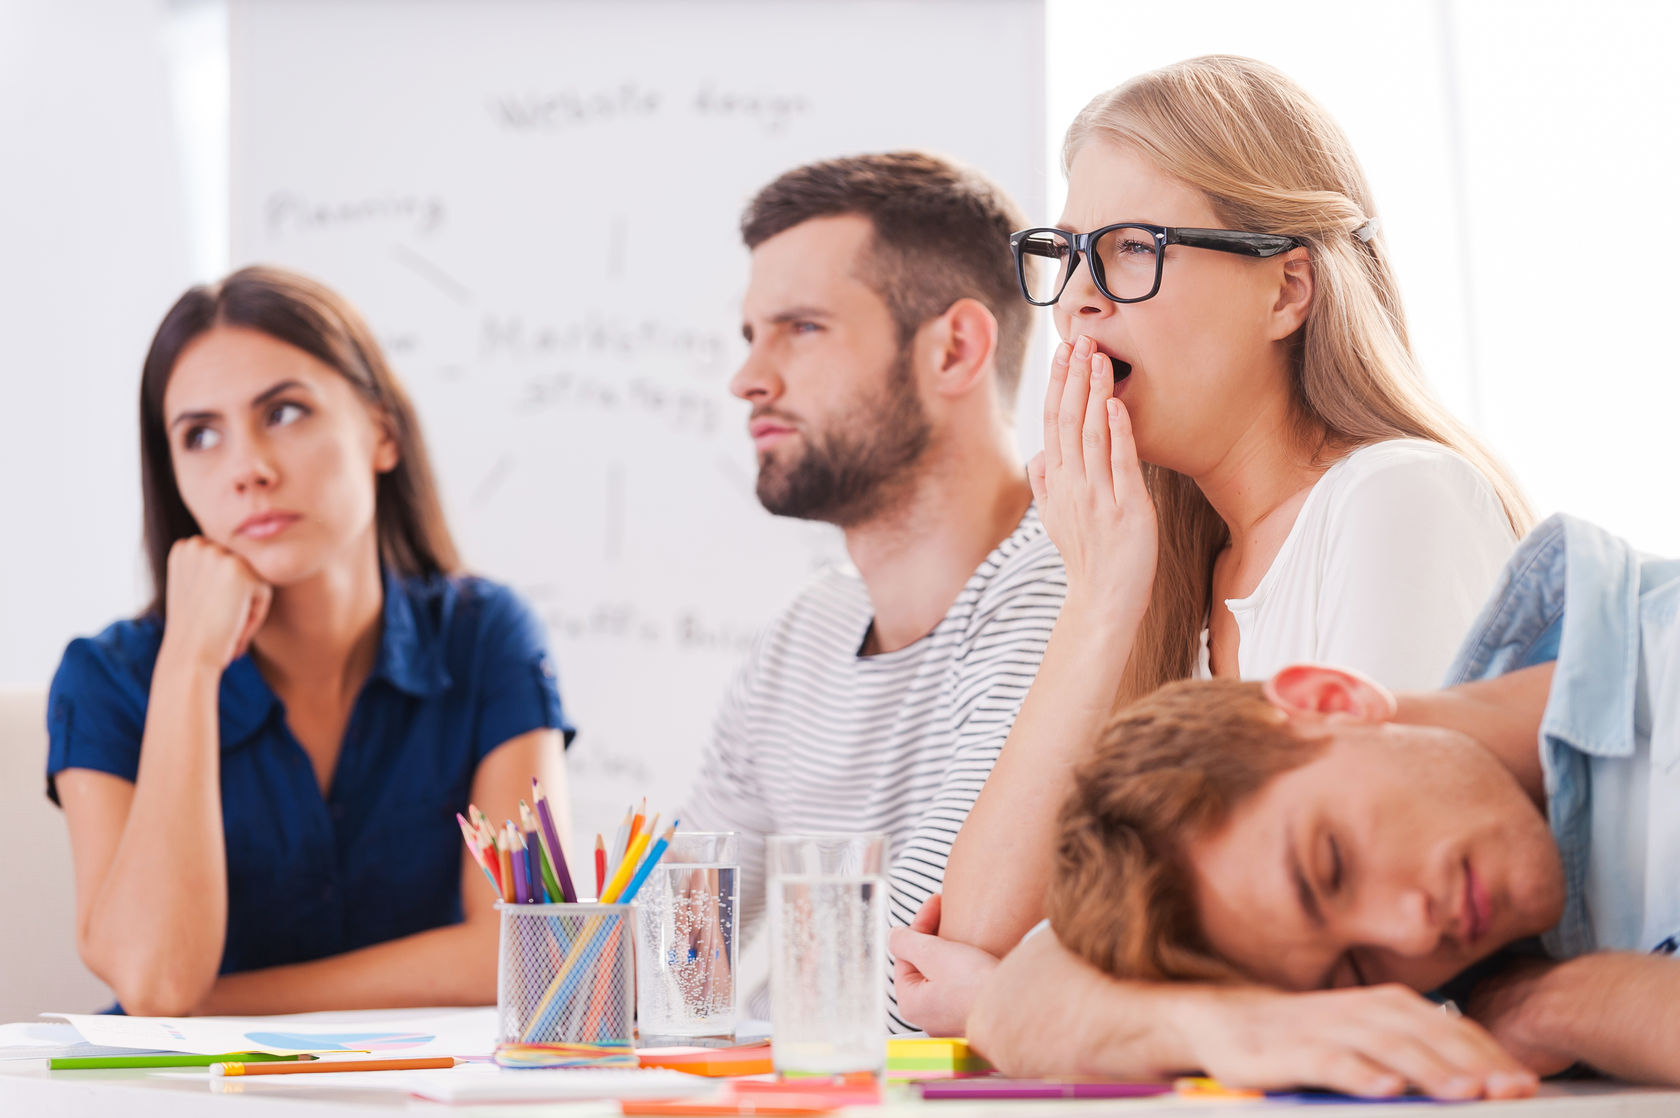 Sick & Tired of Boring Meetings?!